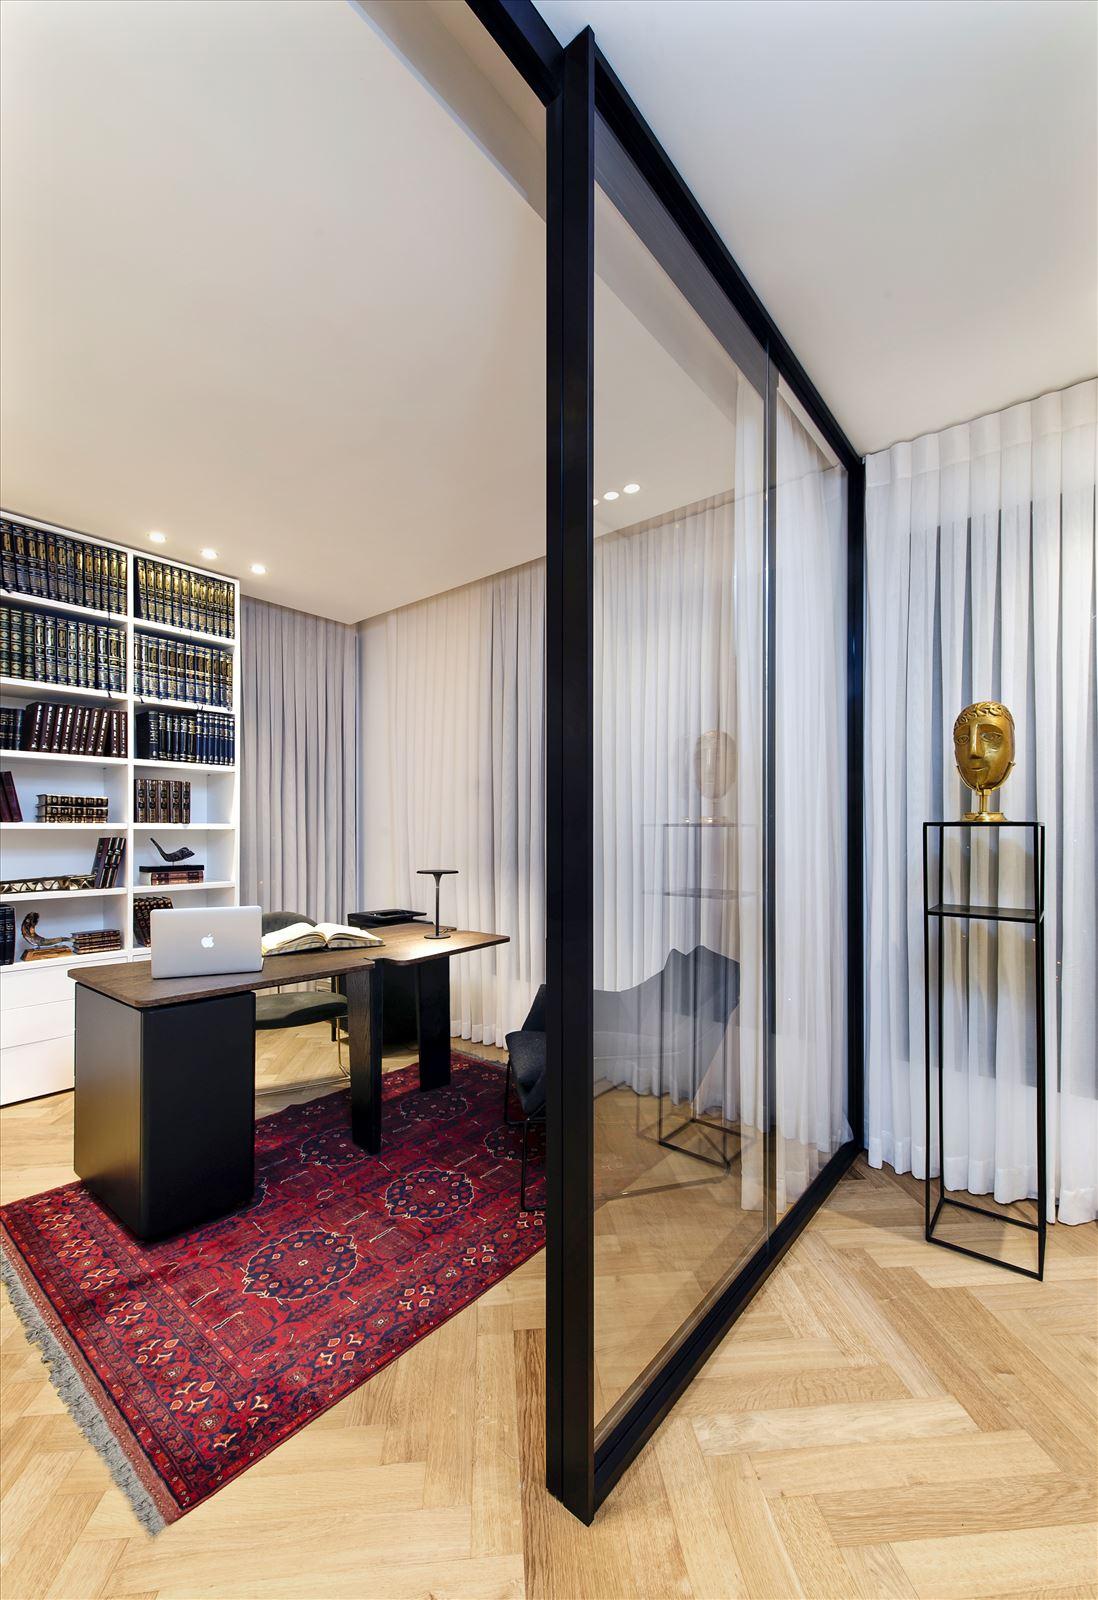 Penthouse - Petah Tikva חדר העבודה מואר בגופי תאורה מיוחדים בתכנון דורי קמחי